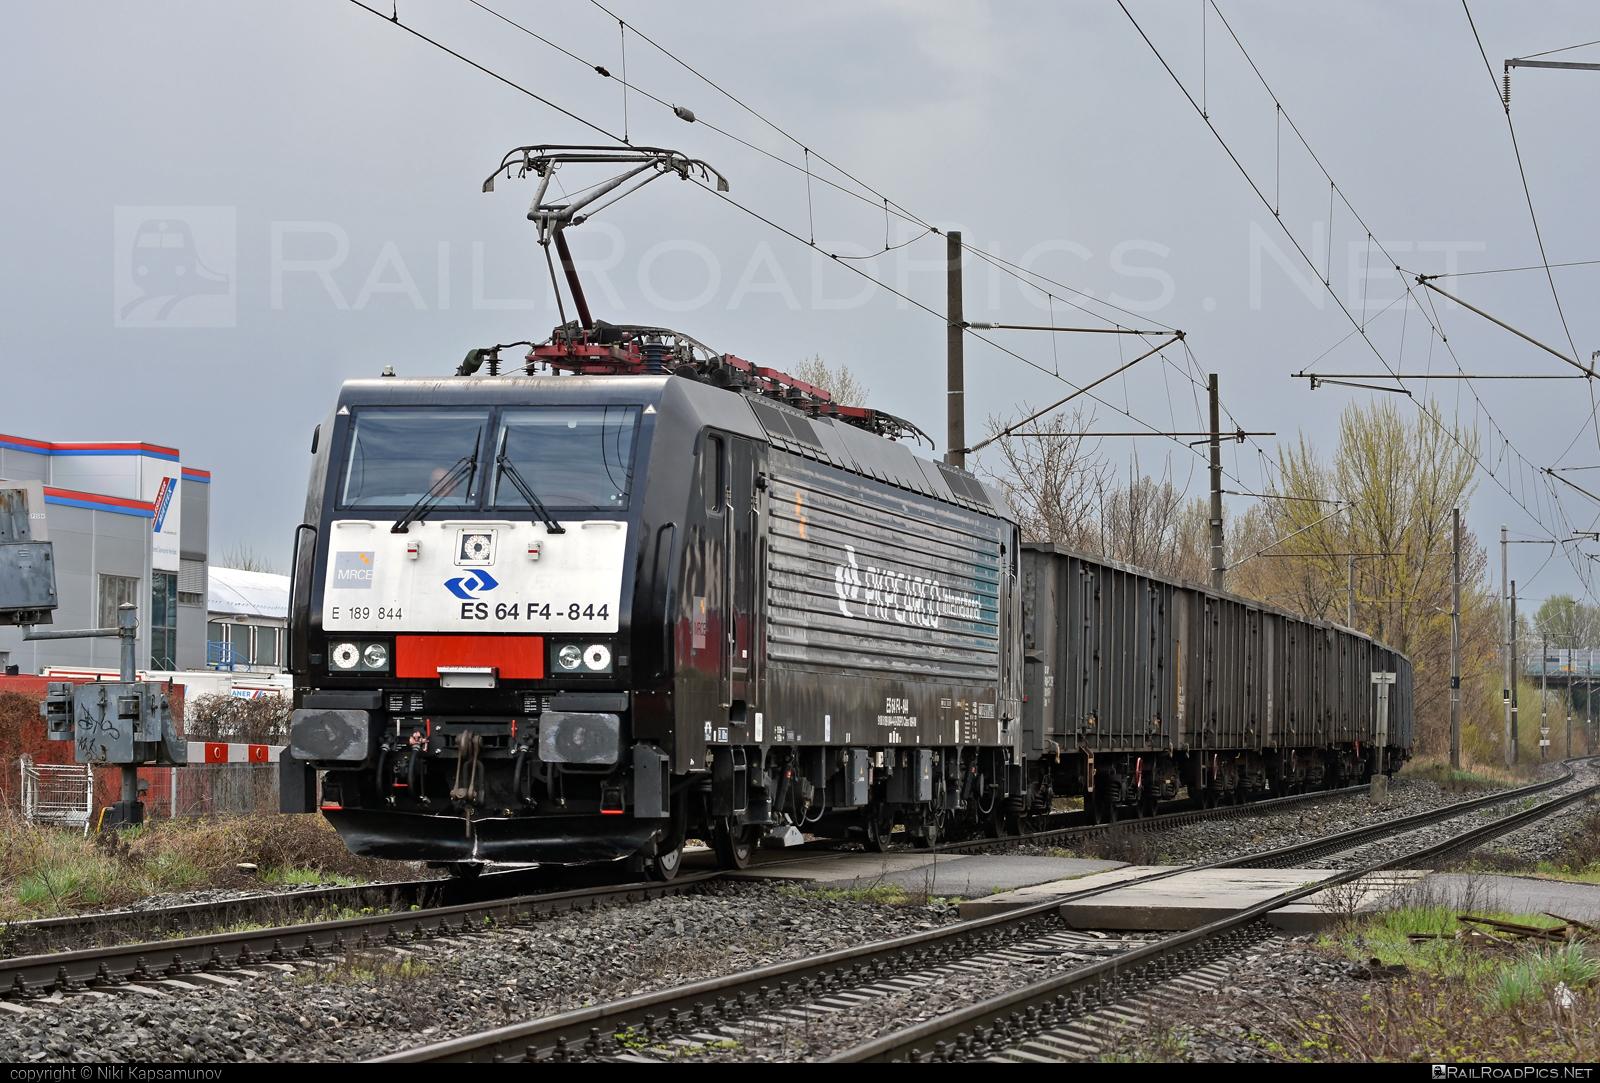 Siemens ES 64 F4 - 189 844 operated by PKP CARGO INTERNATIONAL a.s. #dispolok #es64 #es64f4 #eurosprinter #mitsuirailcapitaleurope #mitsuirailcapitaleuropegmbh #mrce #pkpcargointernational #pkpcargointernationalas #pkpci #siemens #siemenses64 #siemenses64f4